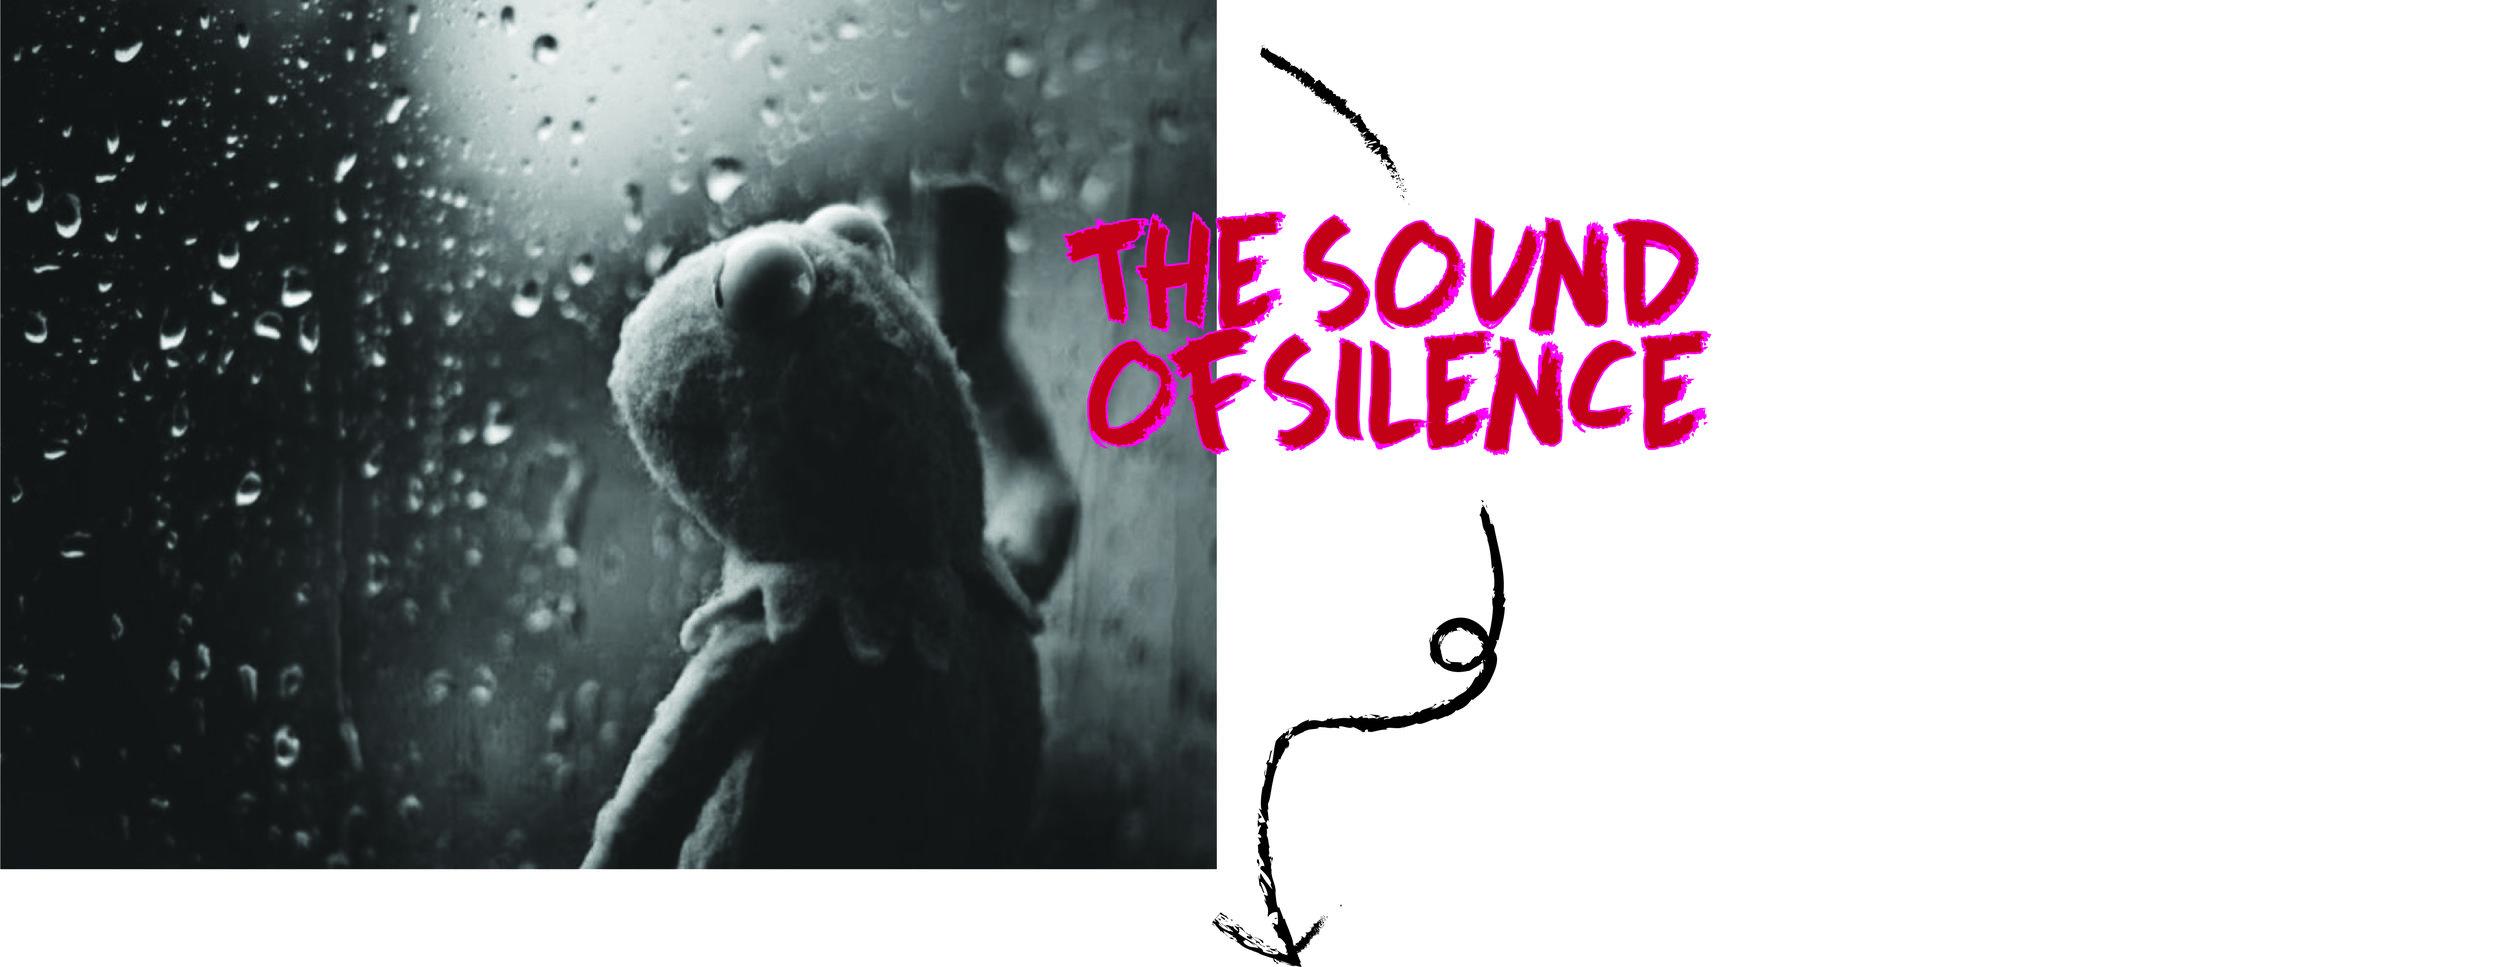 sound of silence.jpg